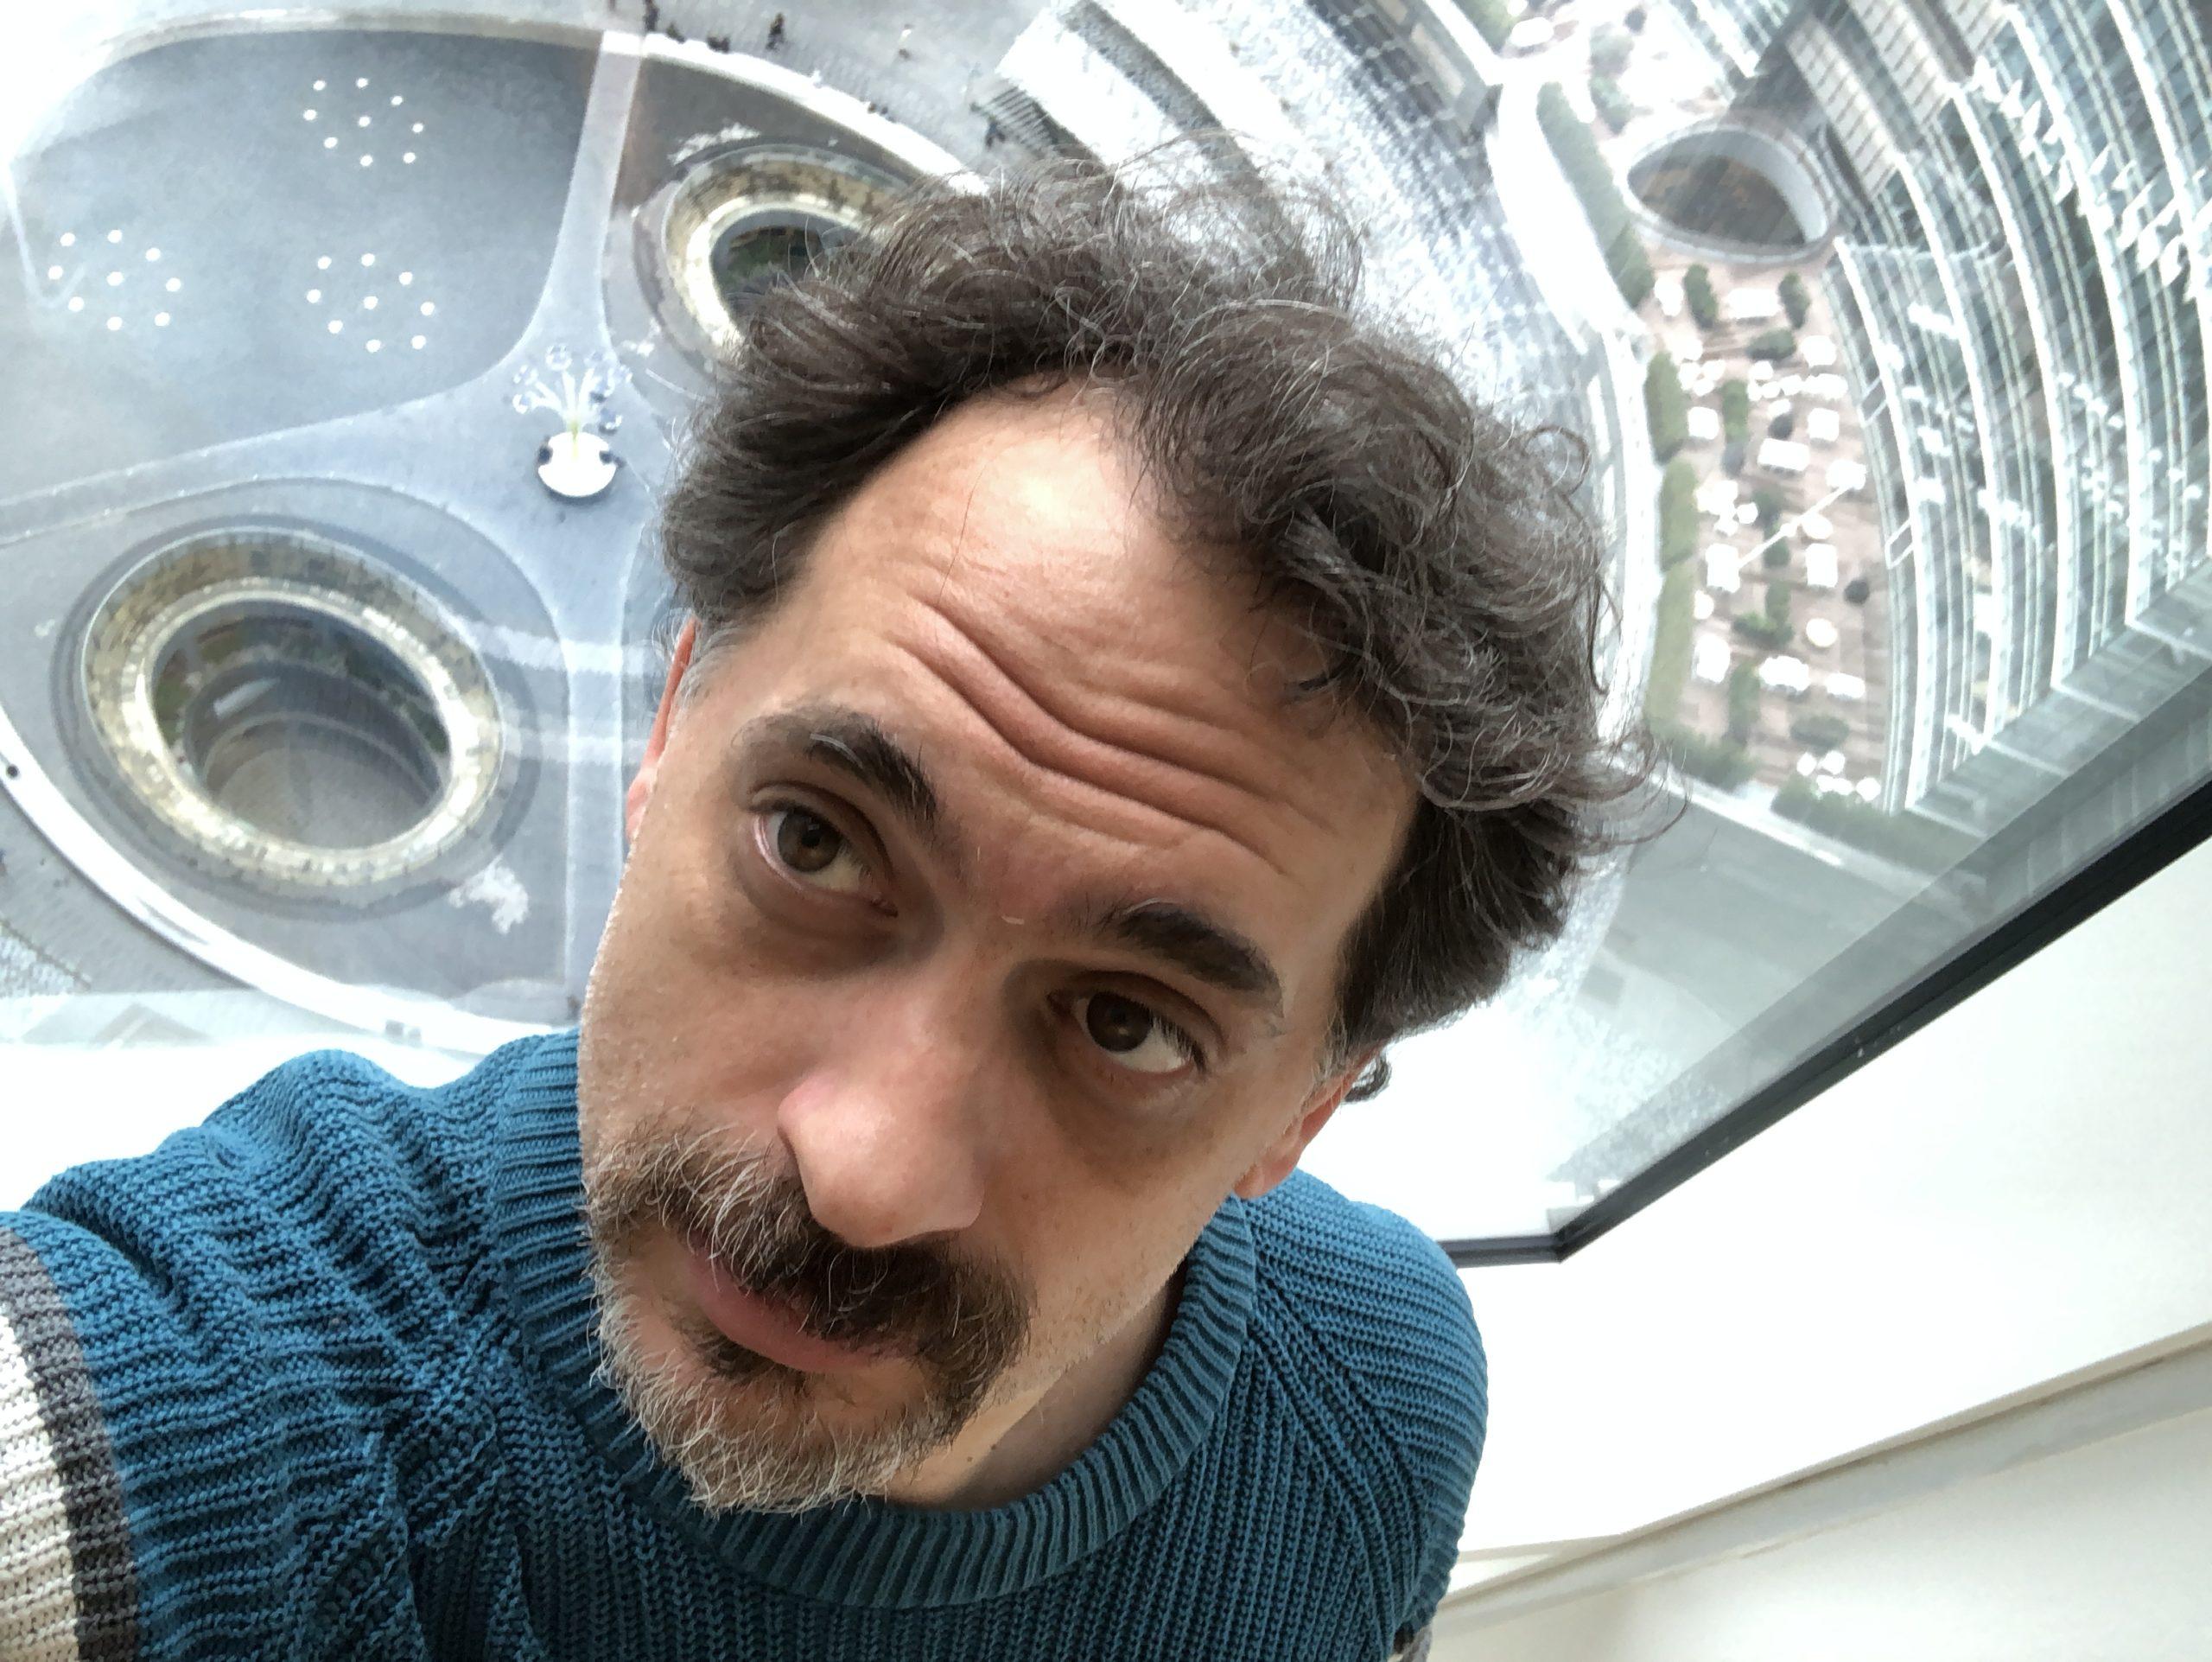 Giovanni Rosina